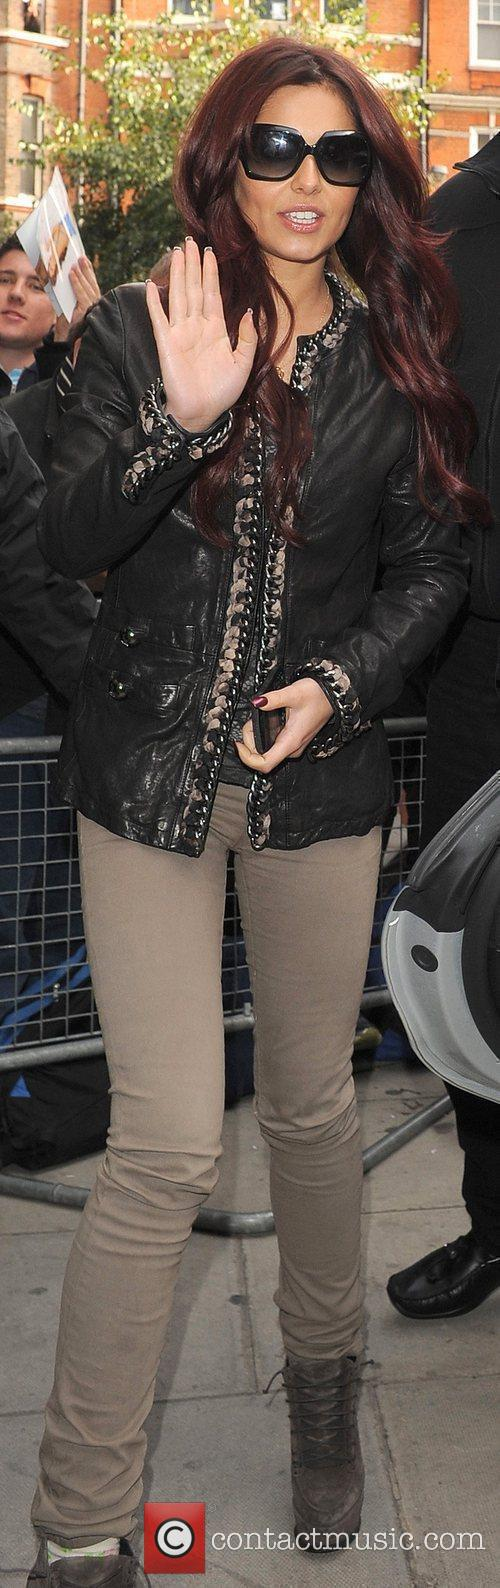 Cheryl Cole at BBC Radio 2 Studios.